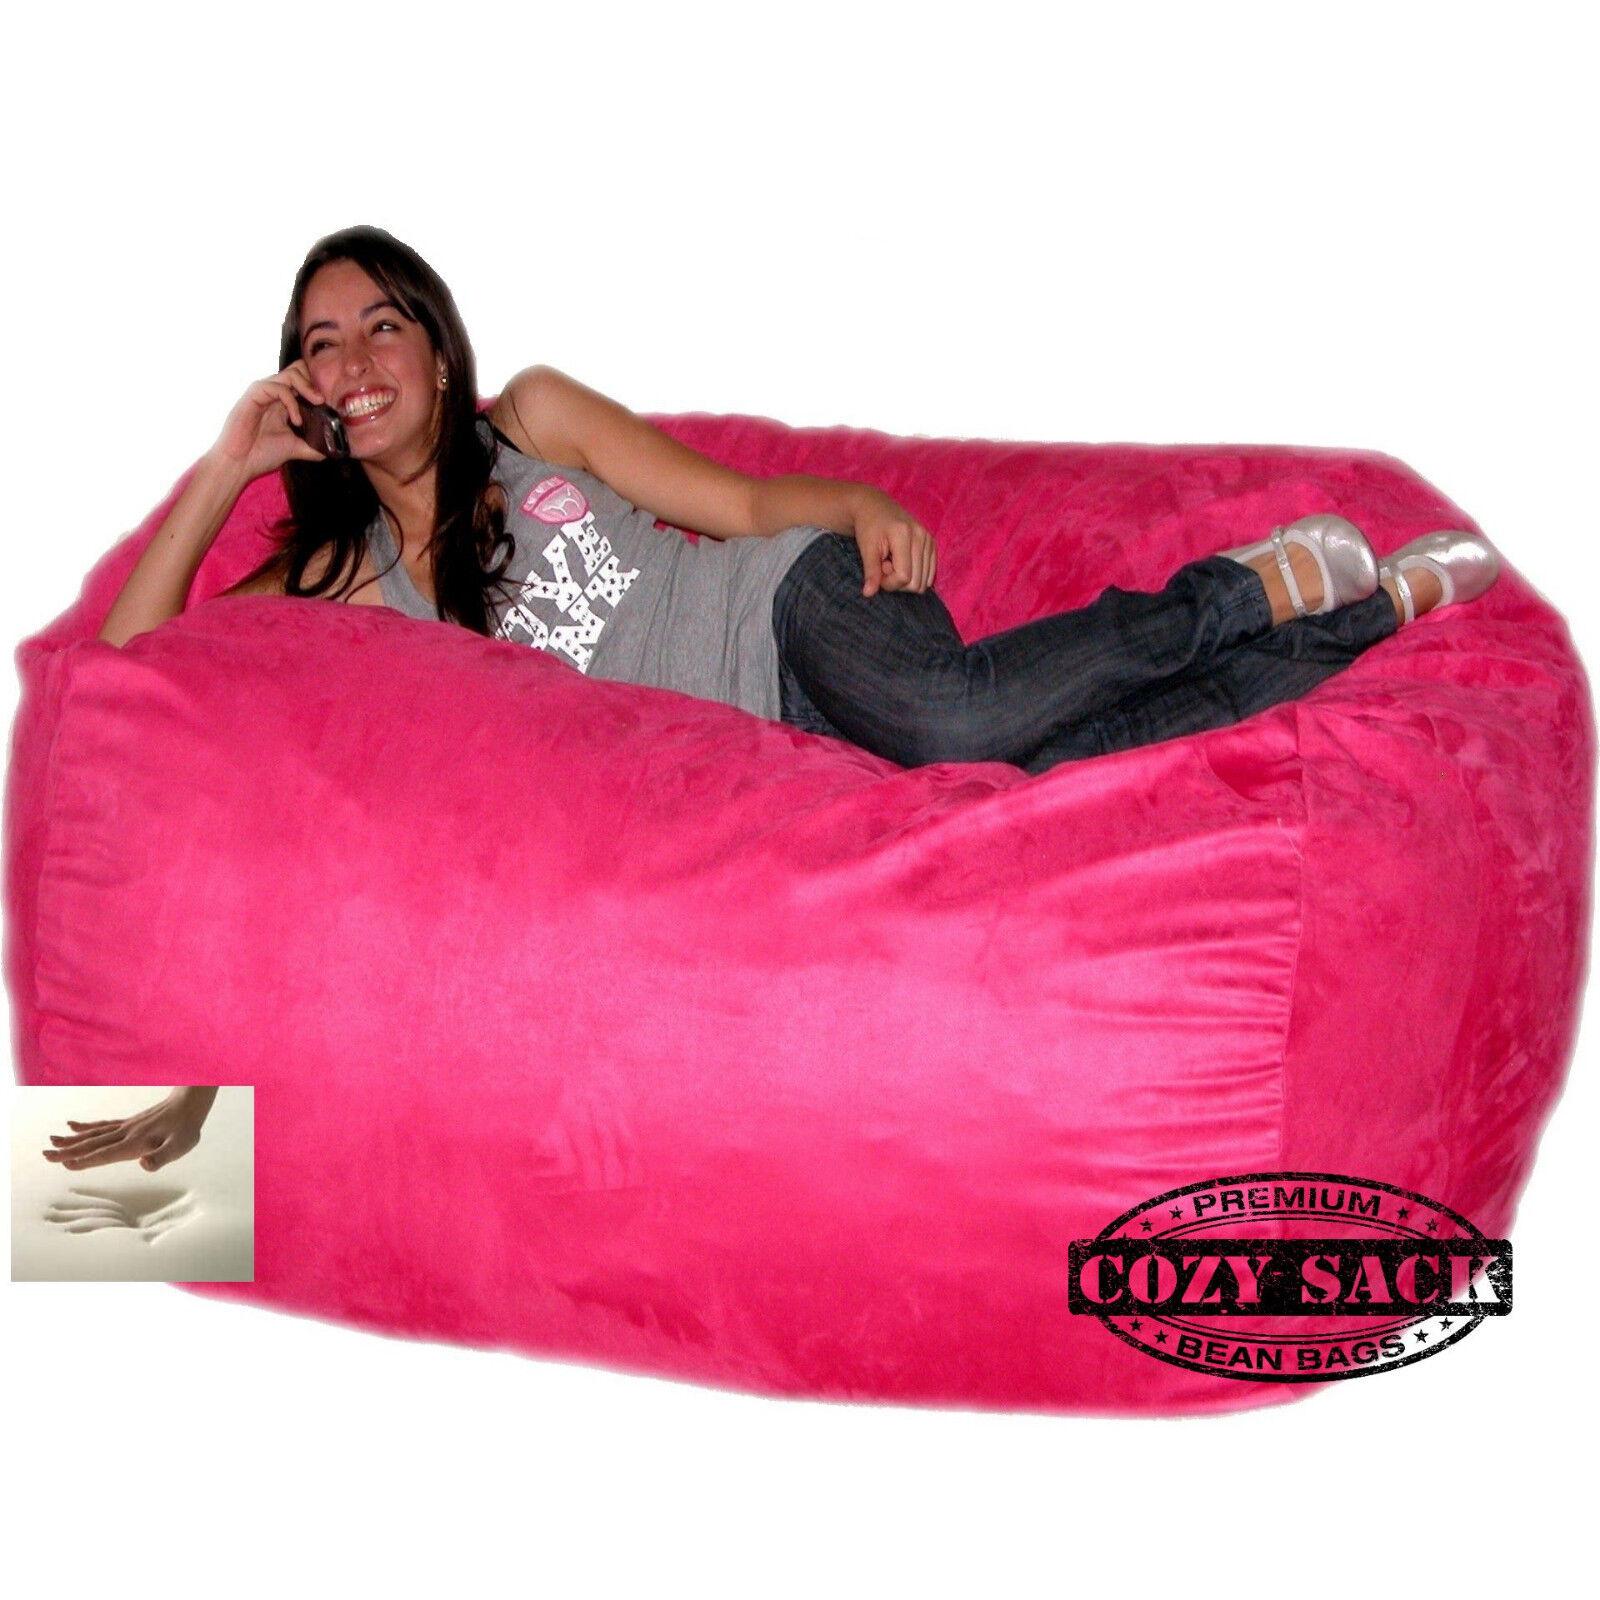 Sensational Giant Bean Bag Chair 6 Cozy Foam Filled By Cozy Sack Buy Factory Direct Uwap Interior Chair Design Uwaporg